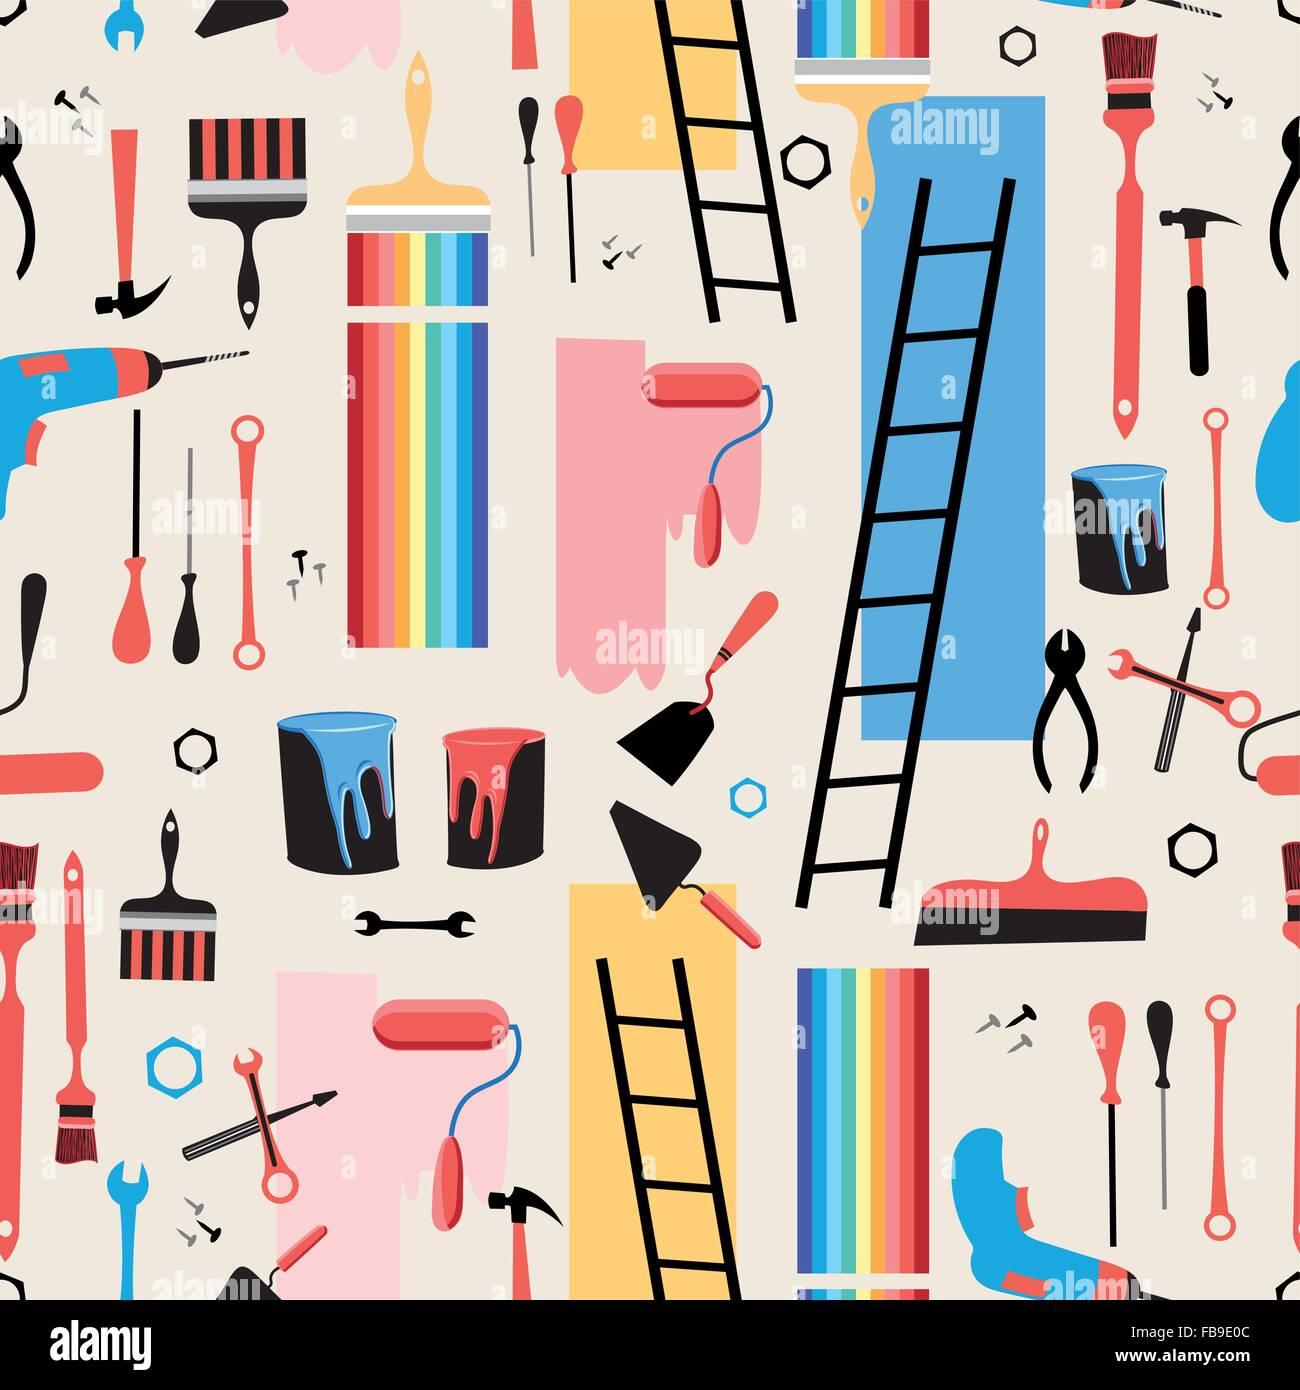 Beautiful vector illustration building tools for the repair of premises - Stock Vector